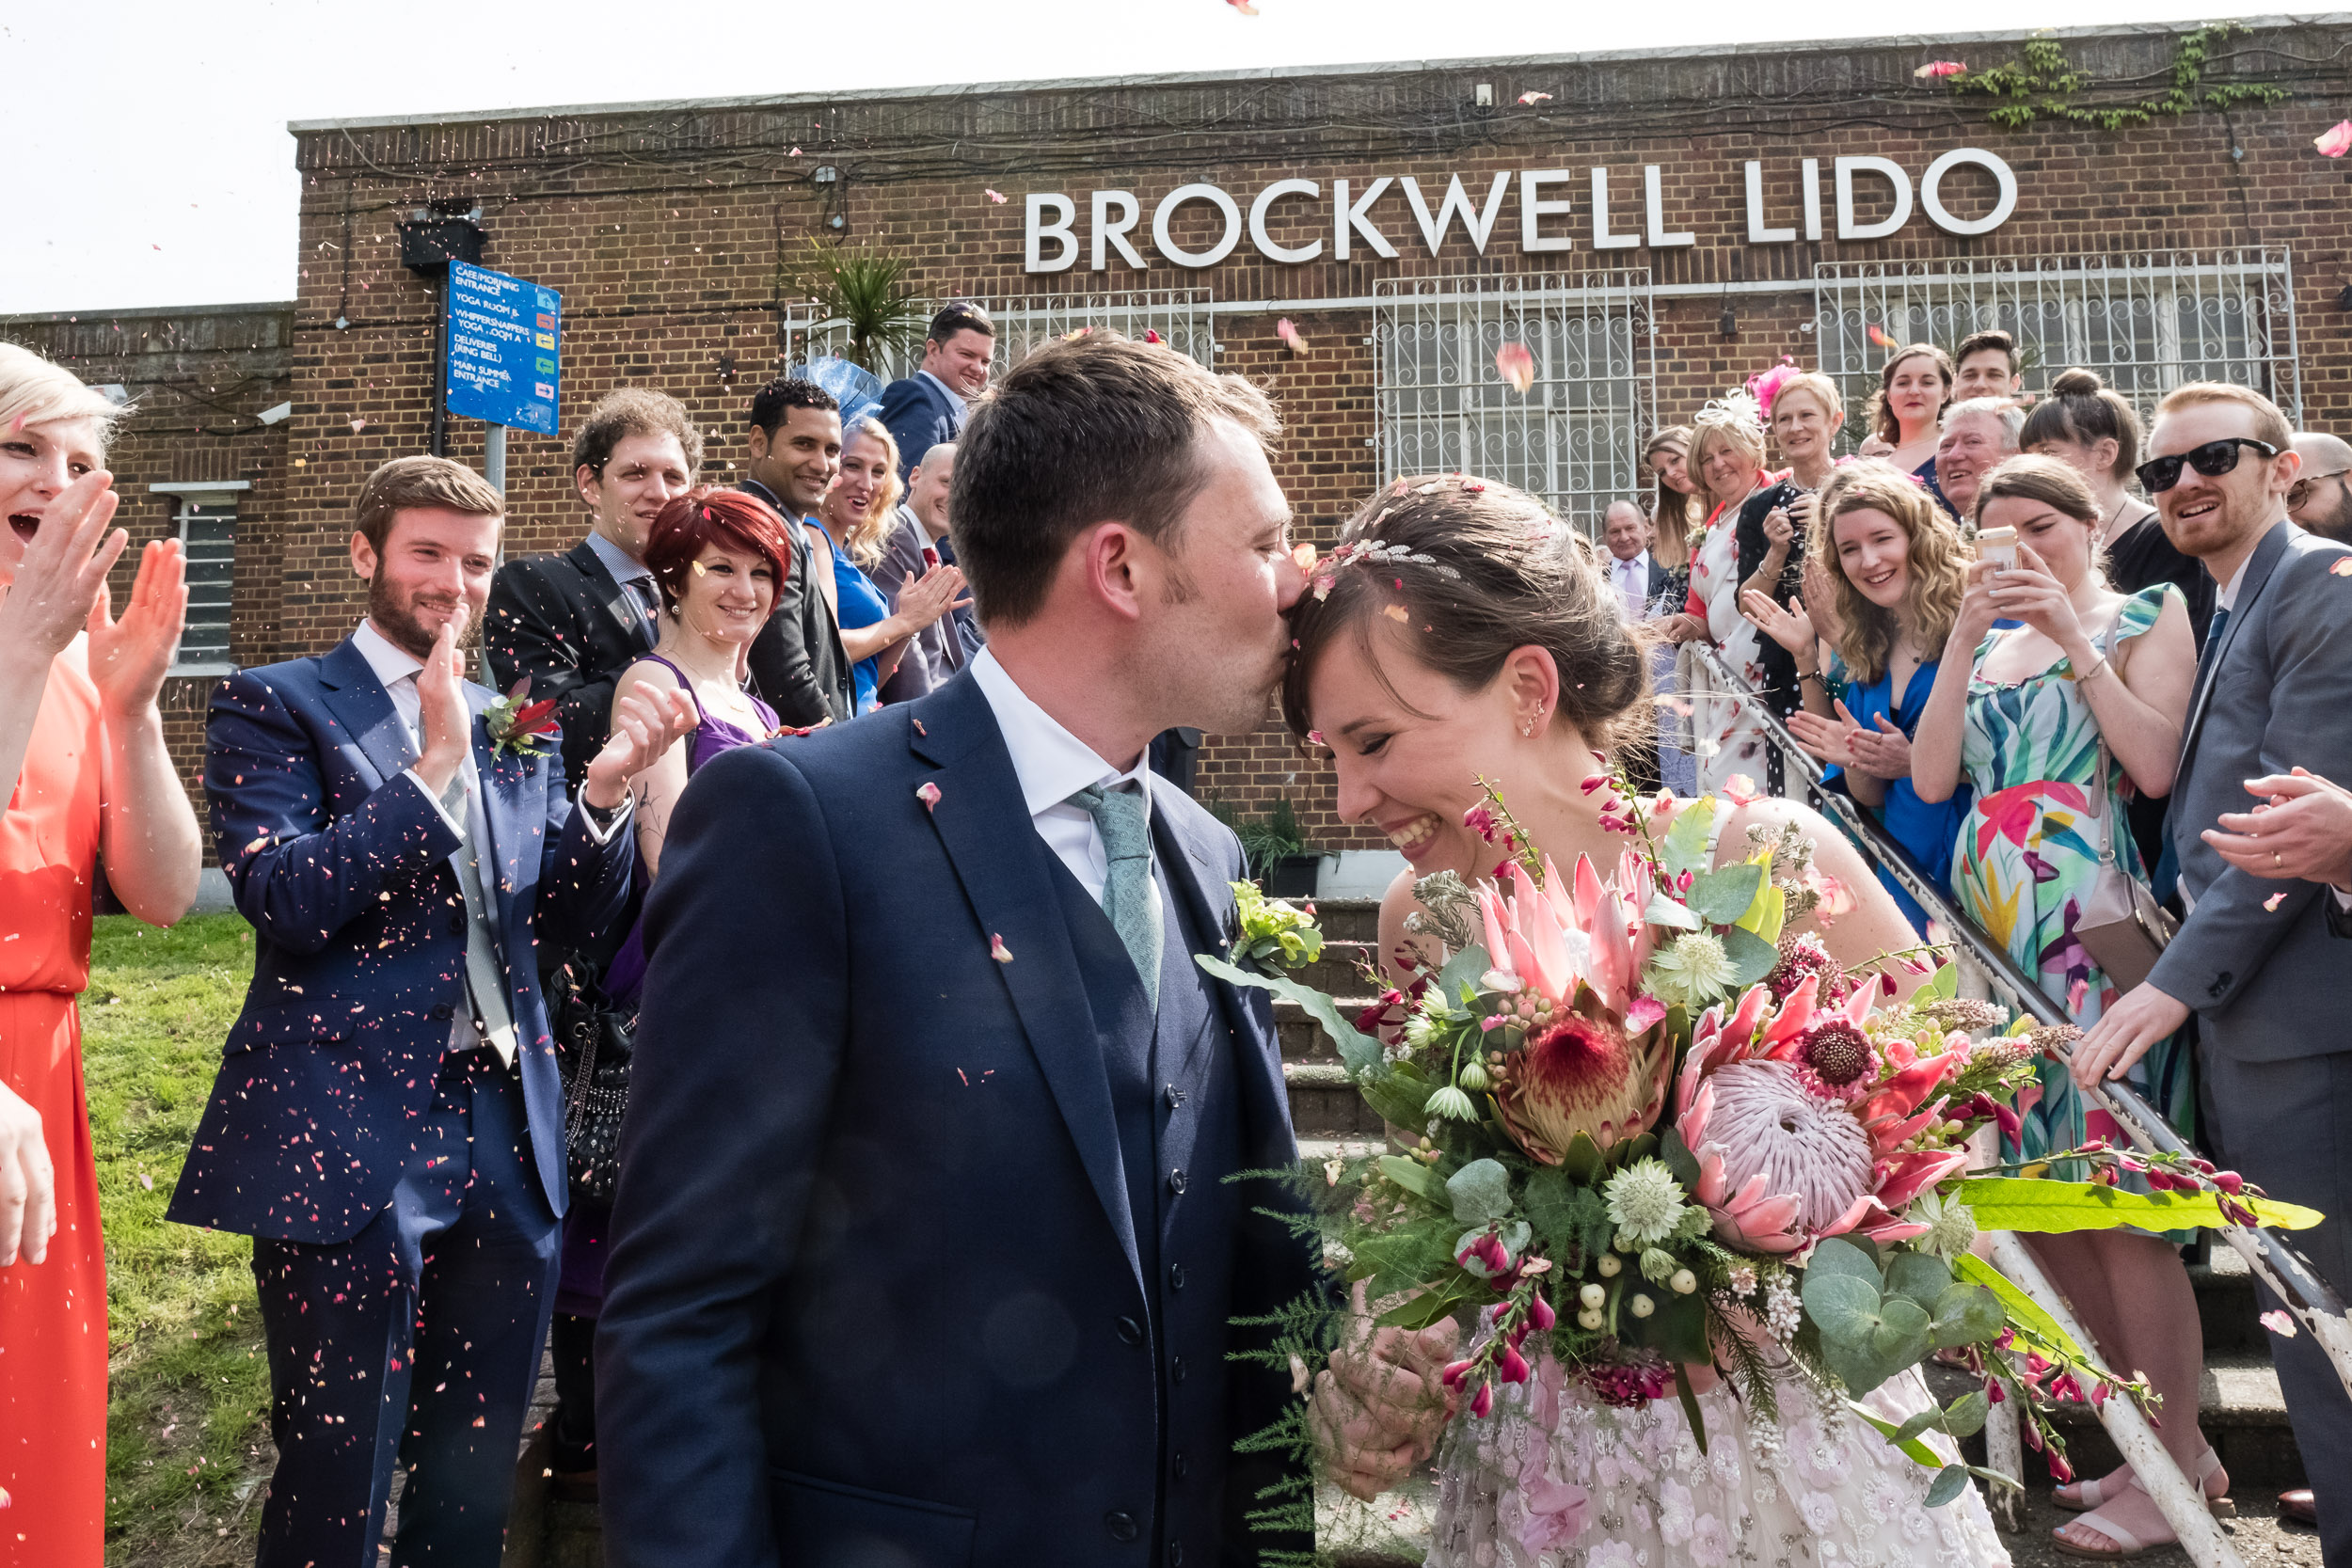 brockwell-lido-brixton-herne-hill-wedding-217.jpg